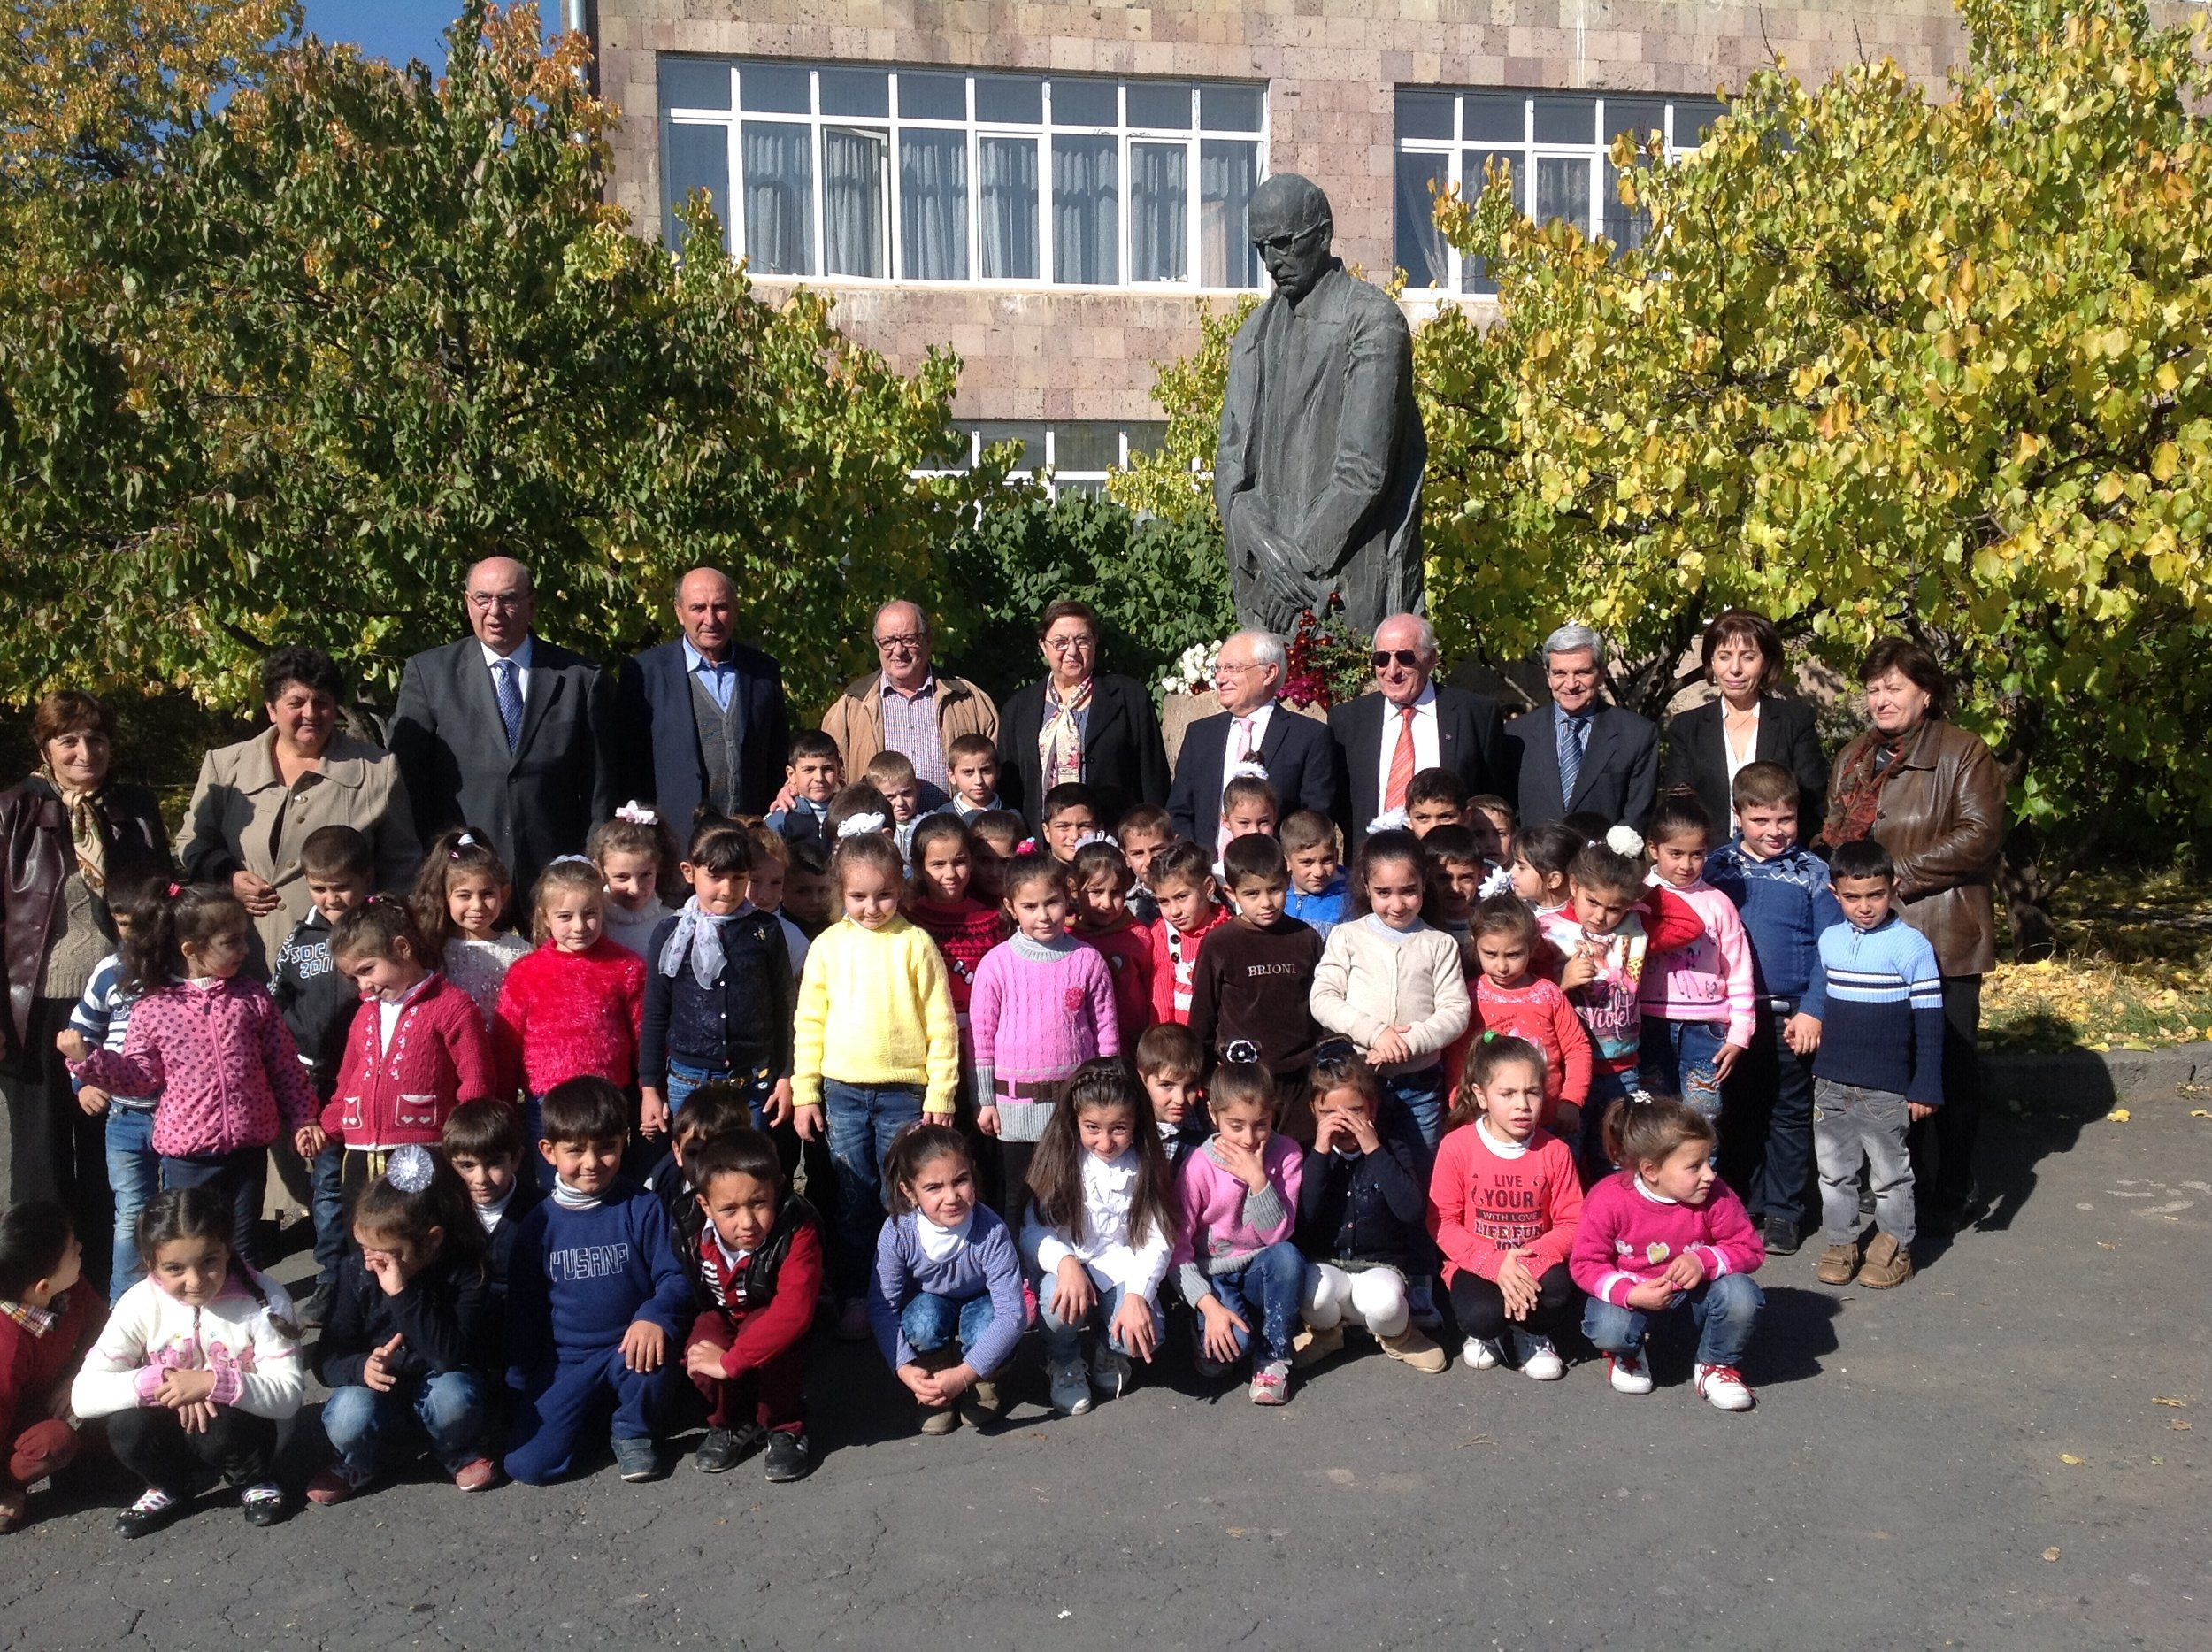 A delegation of Tekeyan Cultural Association leaders visit the Vahan Tekeyan School in Karbi, with the statue of Tekeyan in the background.